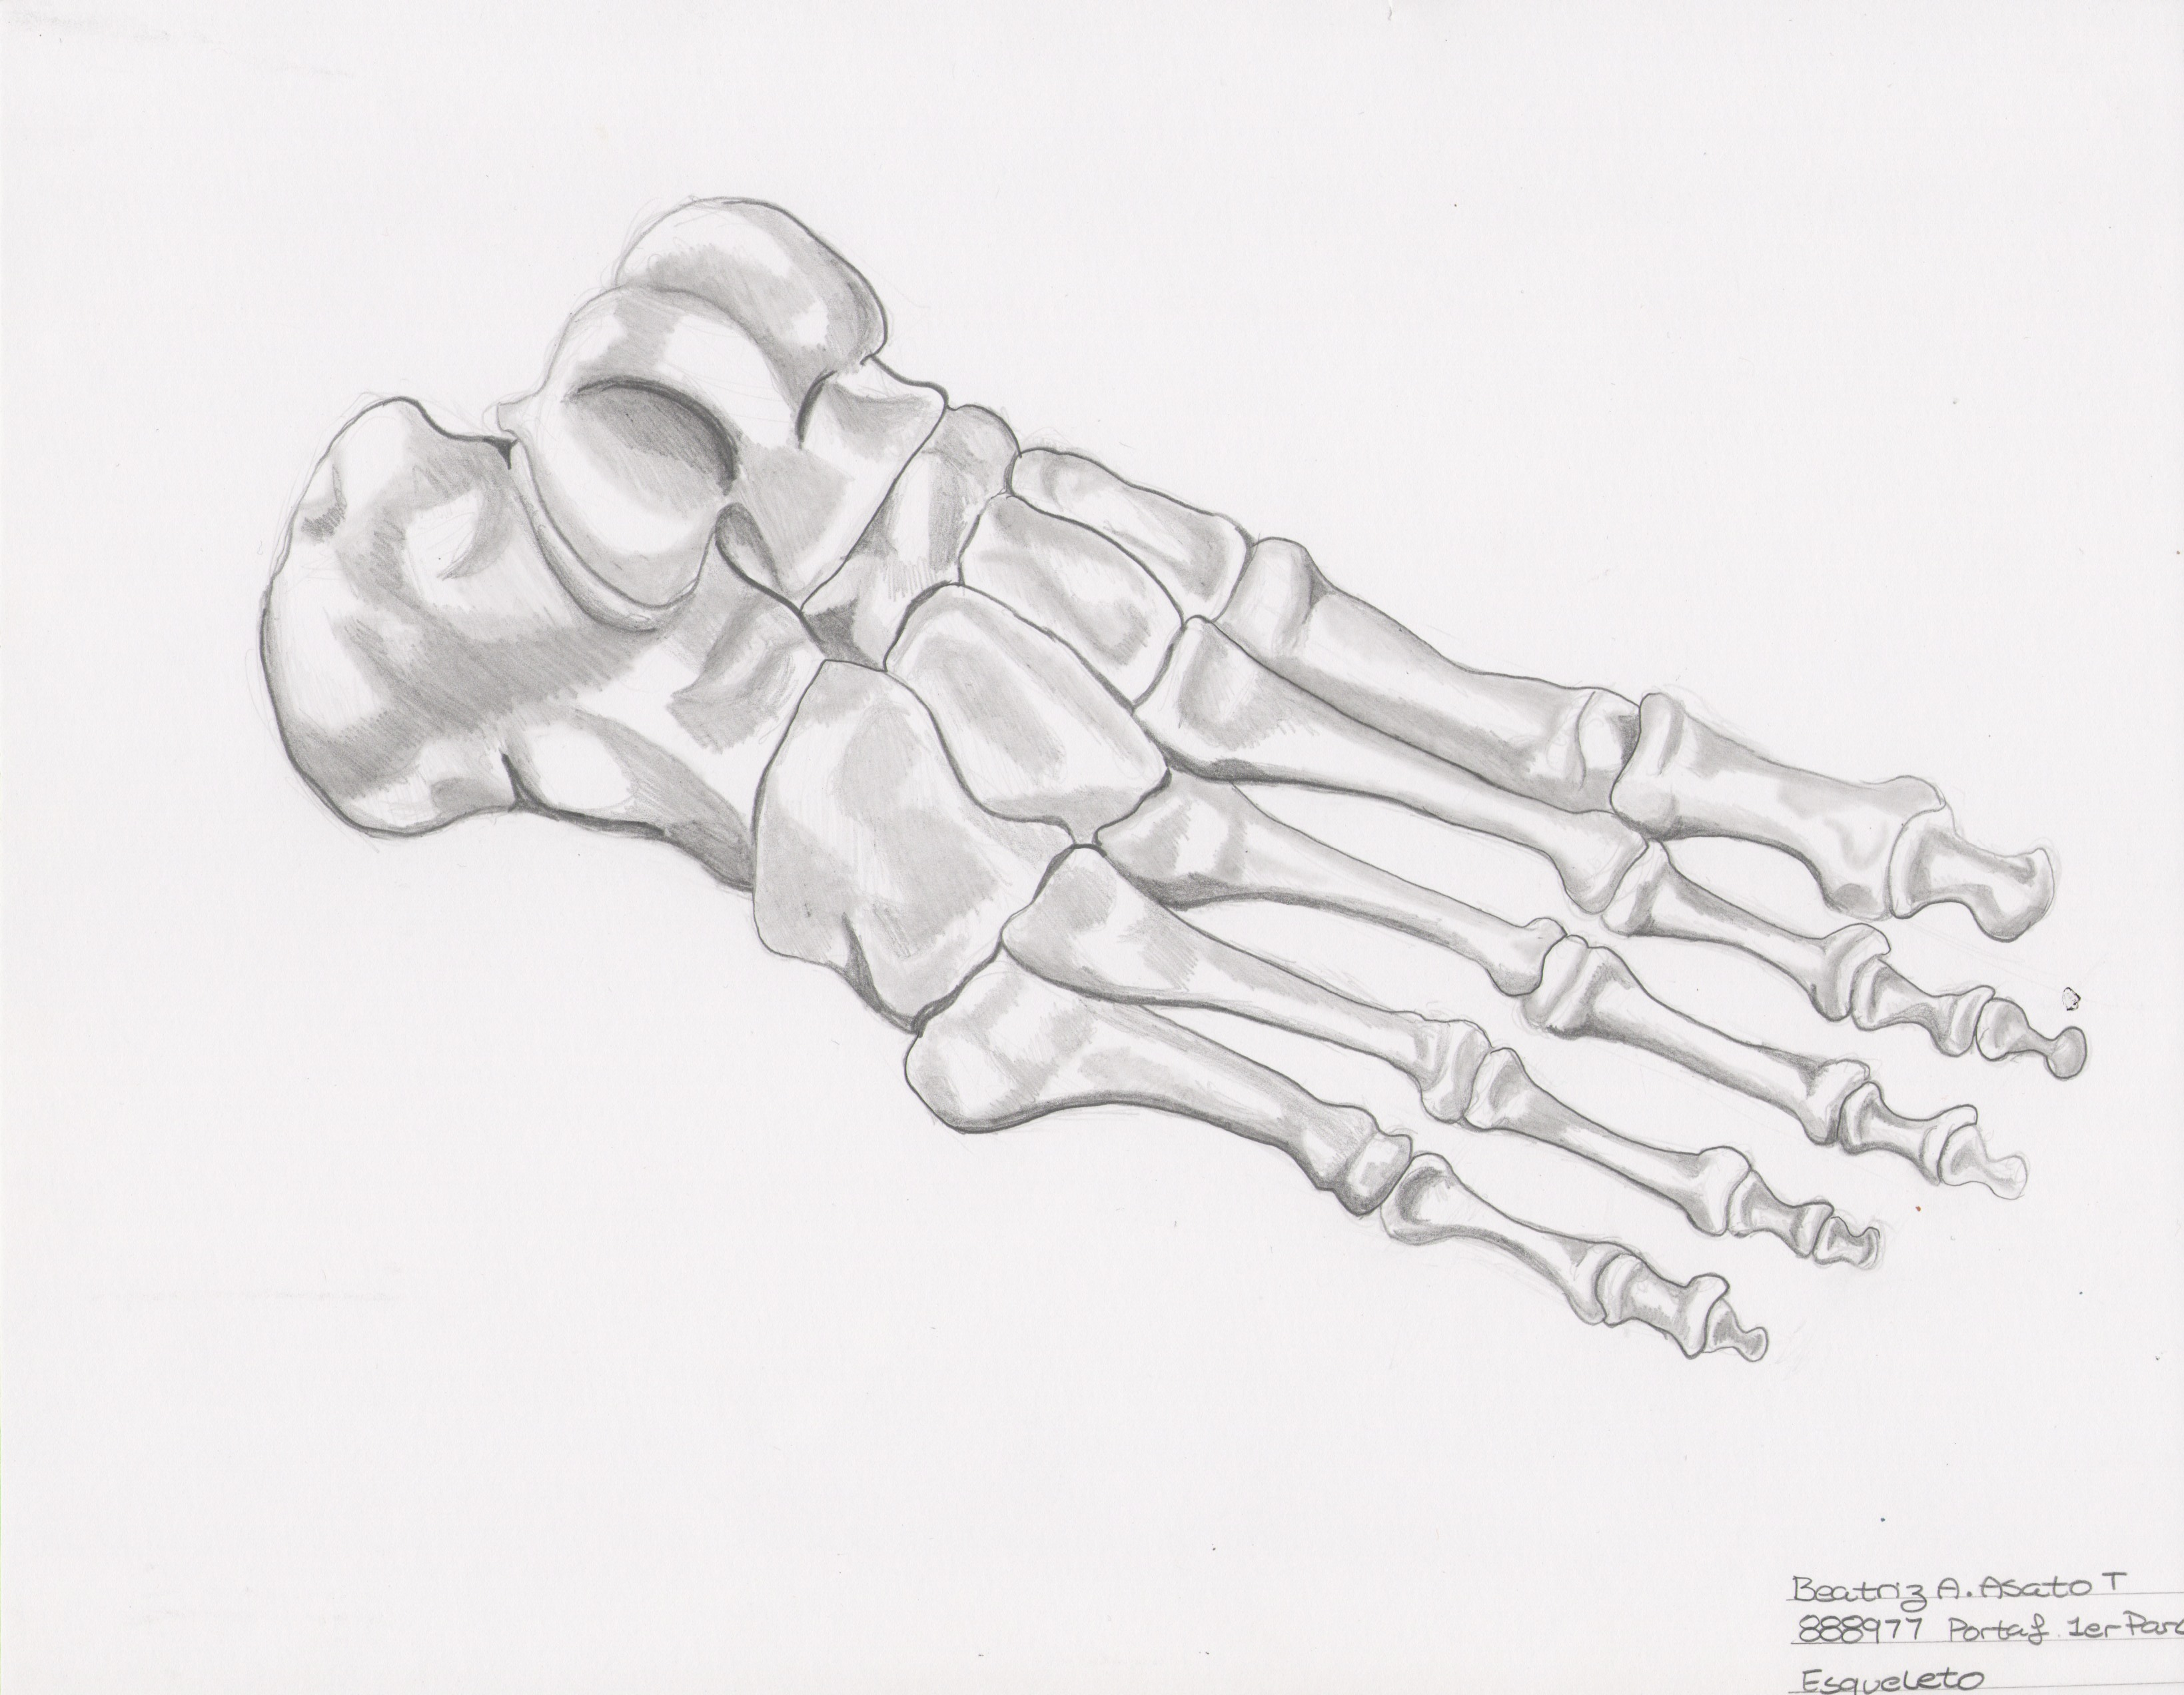 Dibujos a lápiz: Huesos – Beatriz Asato